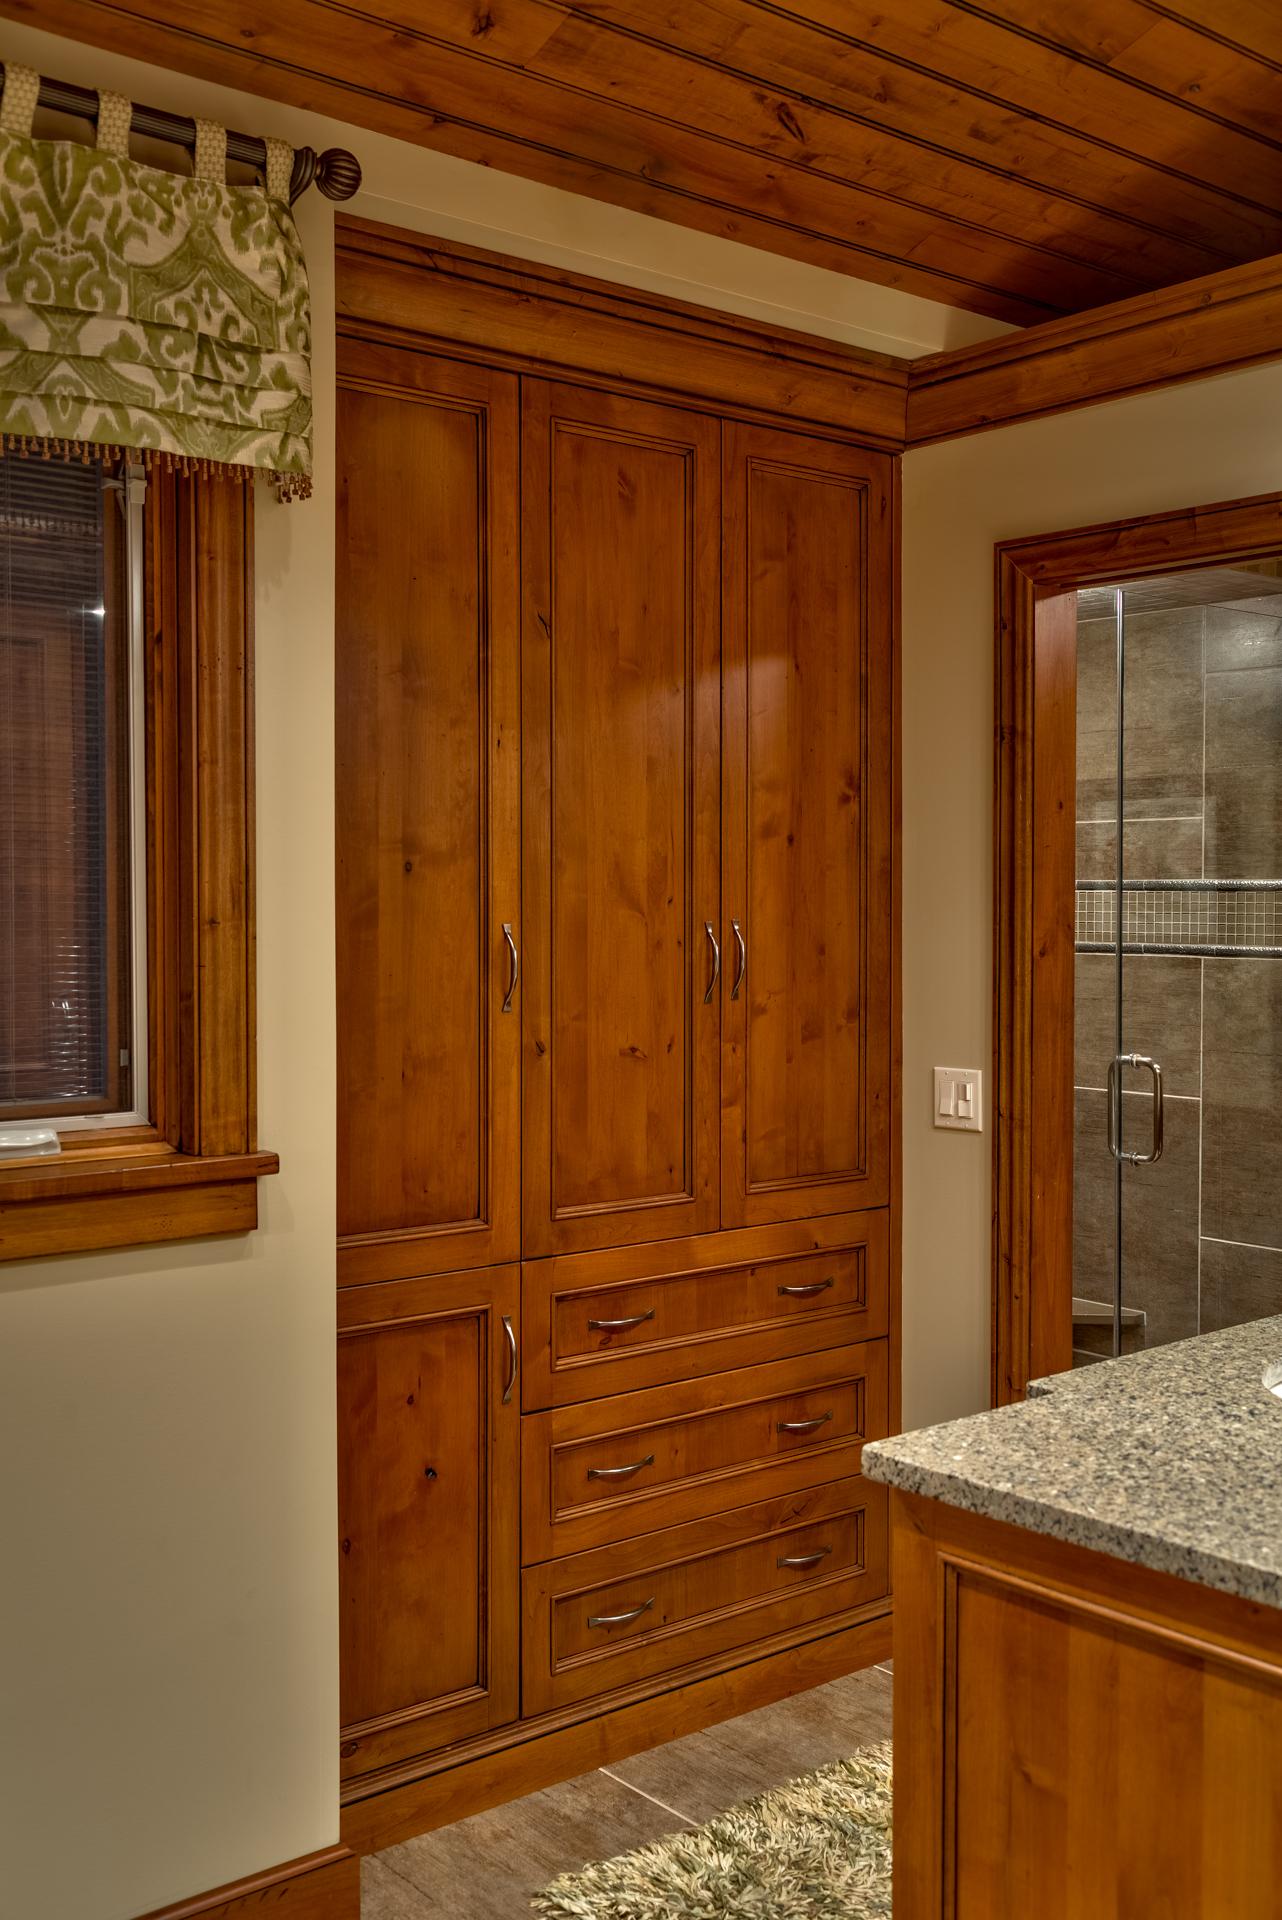 Guest House Closet